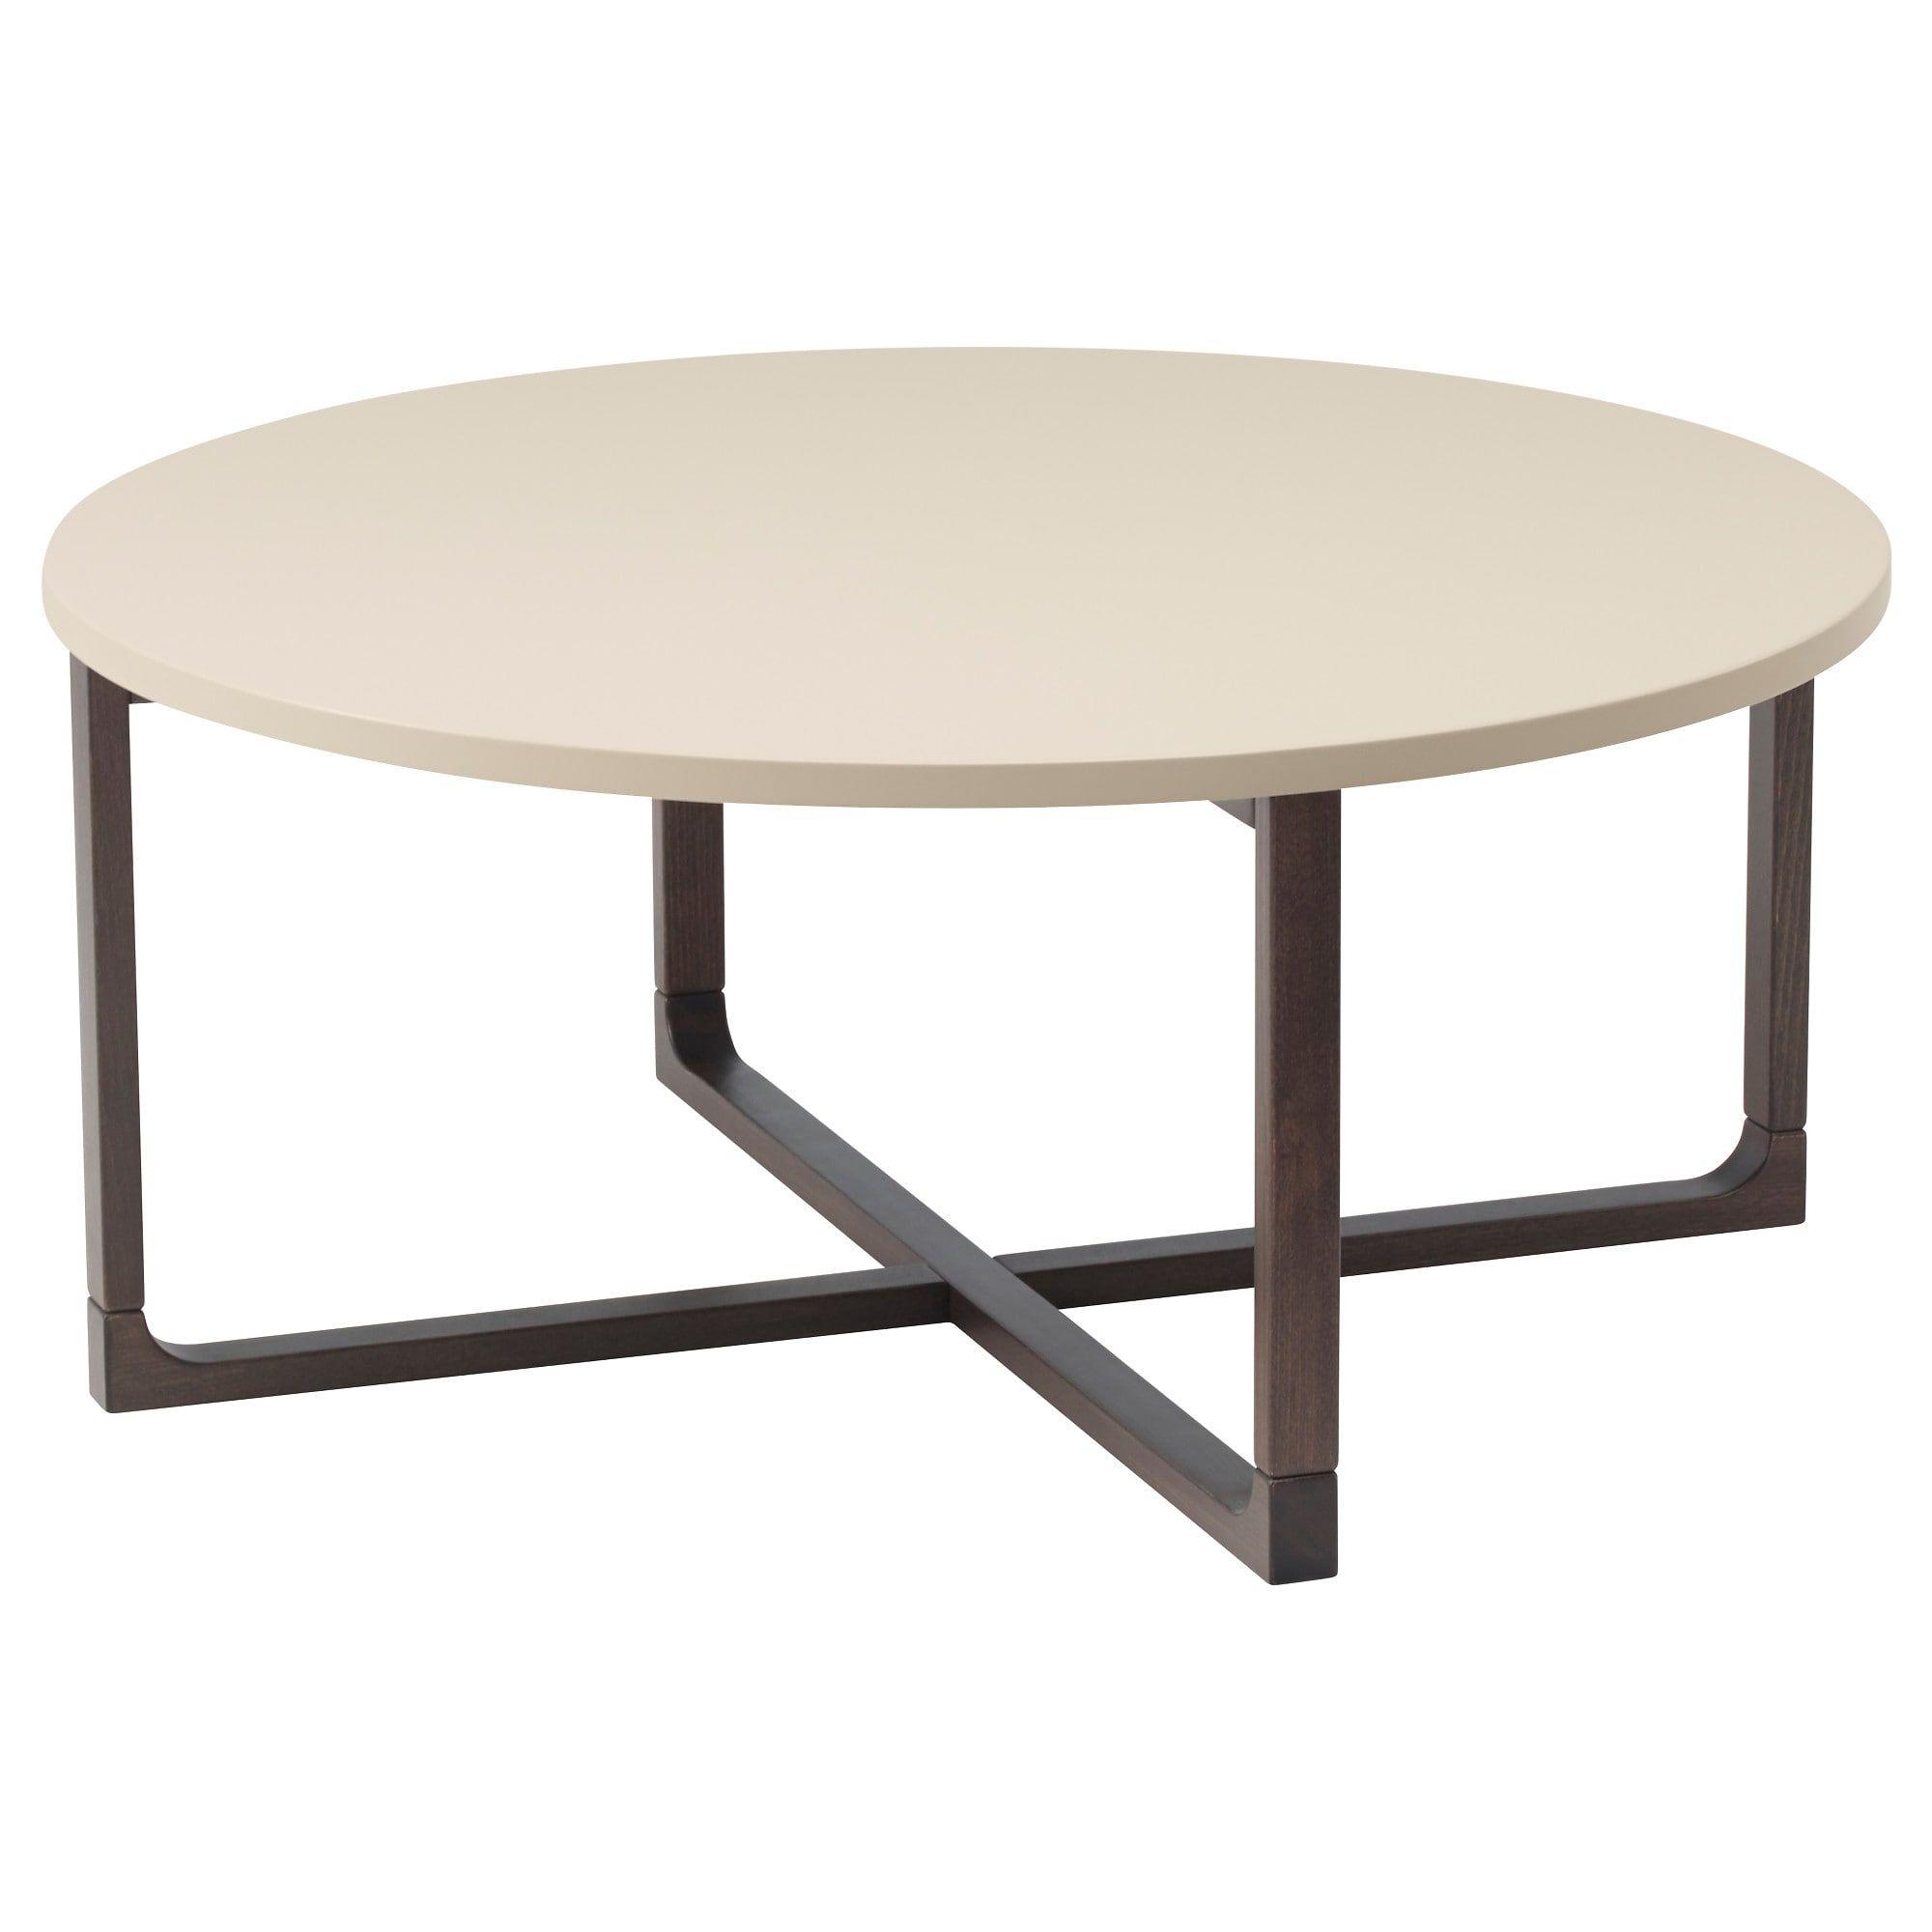 Ikea Us Furniture And Home Furnishings Ikea Coffee Table Coffee Table Round Coffee Table Ikea